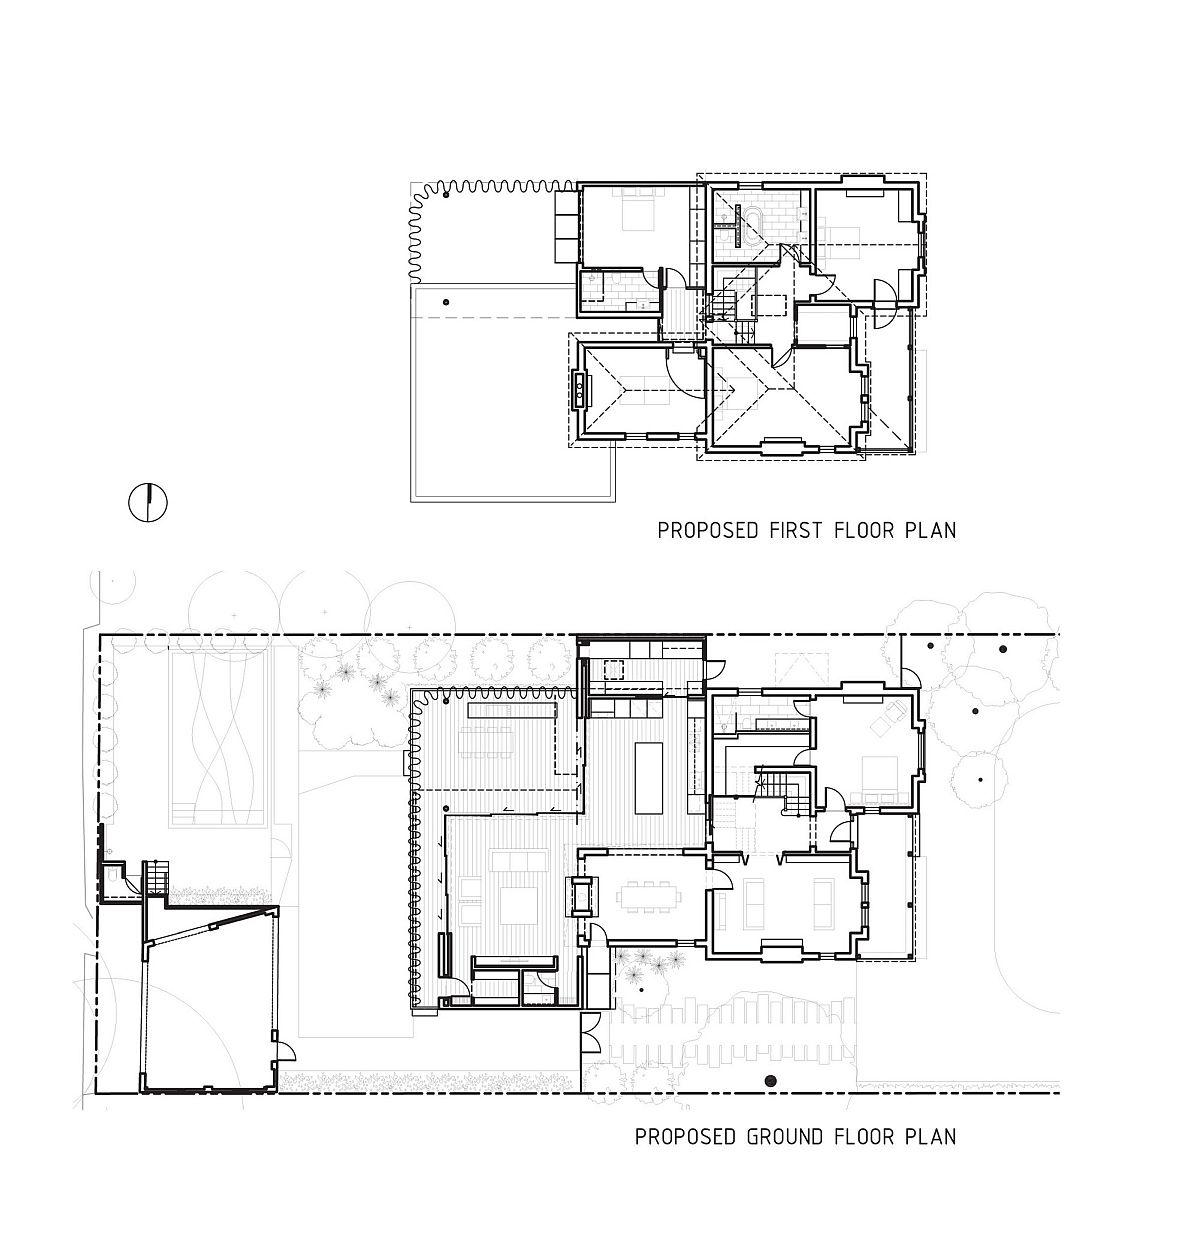 Renovation-plans-of-Hiro-En-House-designed-by-Matt-Gibson-Architecture-Design-41634